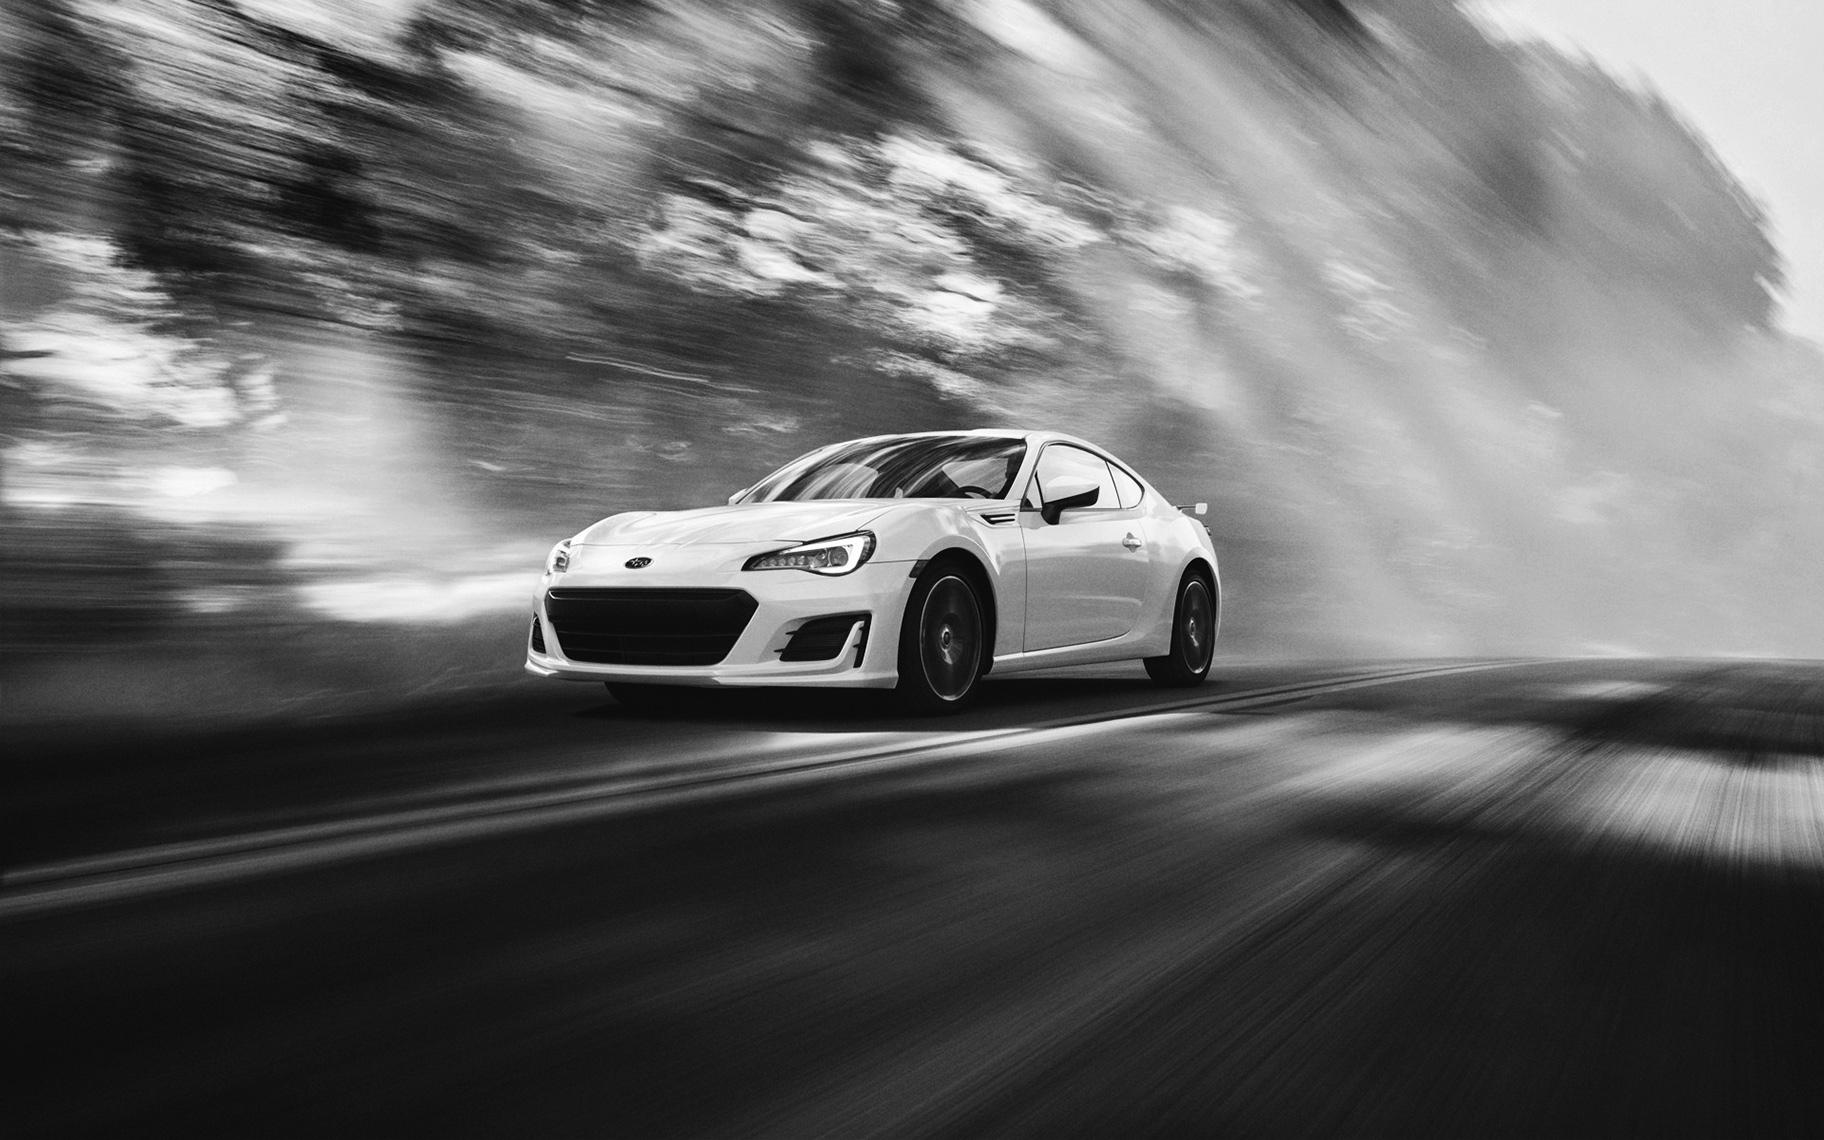 Tyler_Gourley_Photo_Automotive_231.jpg